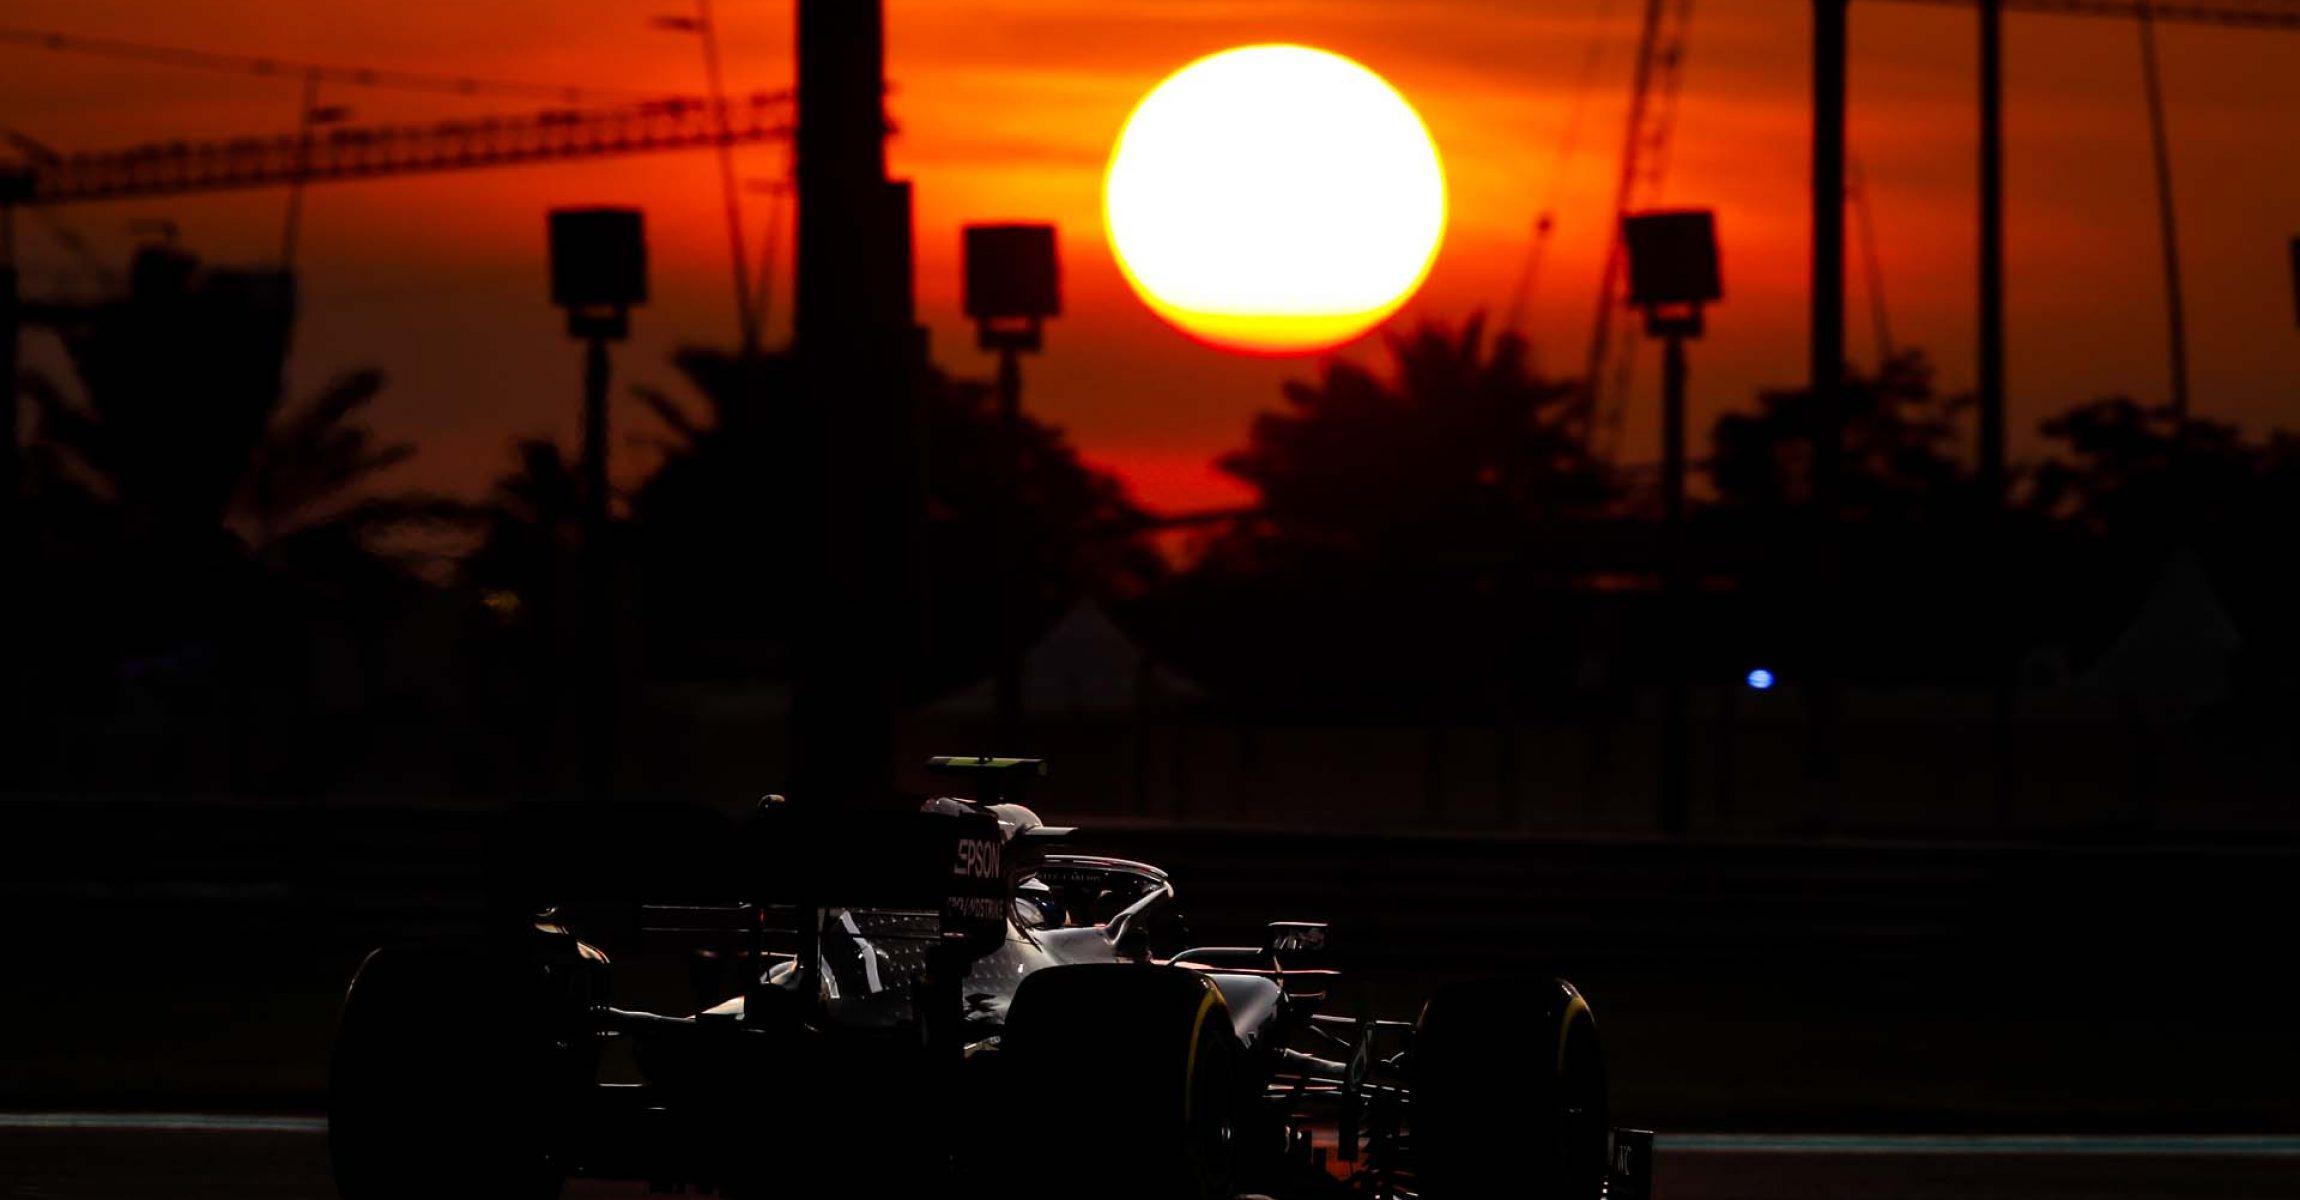 2019 Abu Dhabi Grand Prix, Saturday - Wolfgang Wilhelm Valtteri Bottas Mercedes